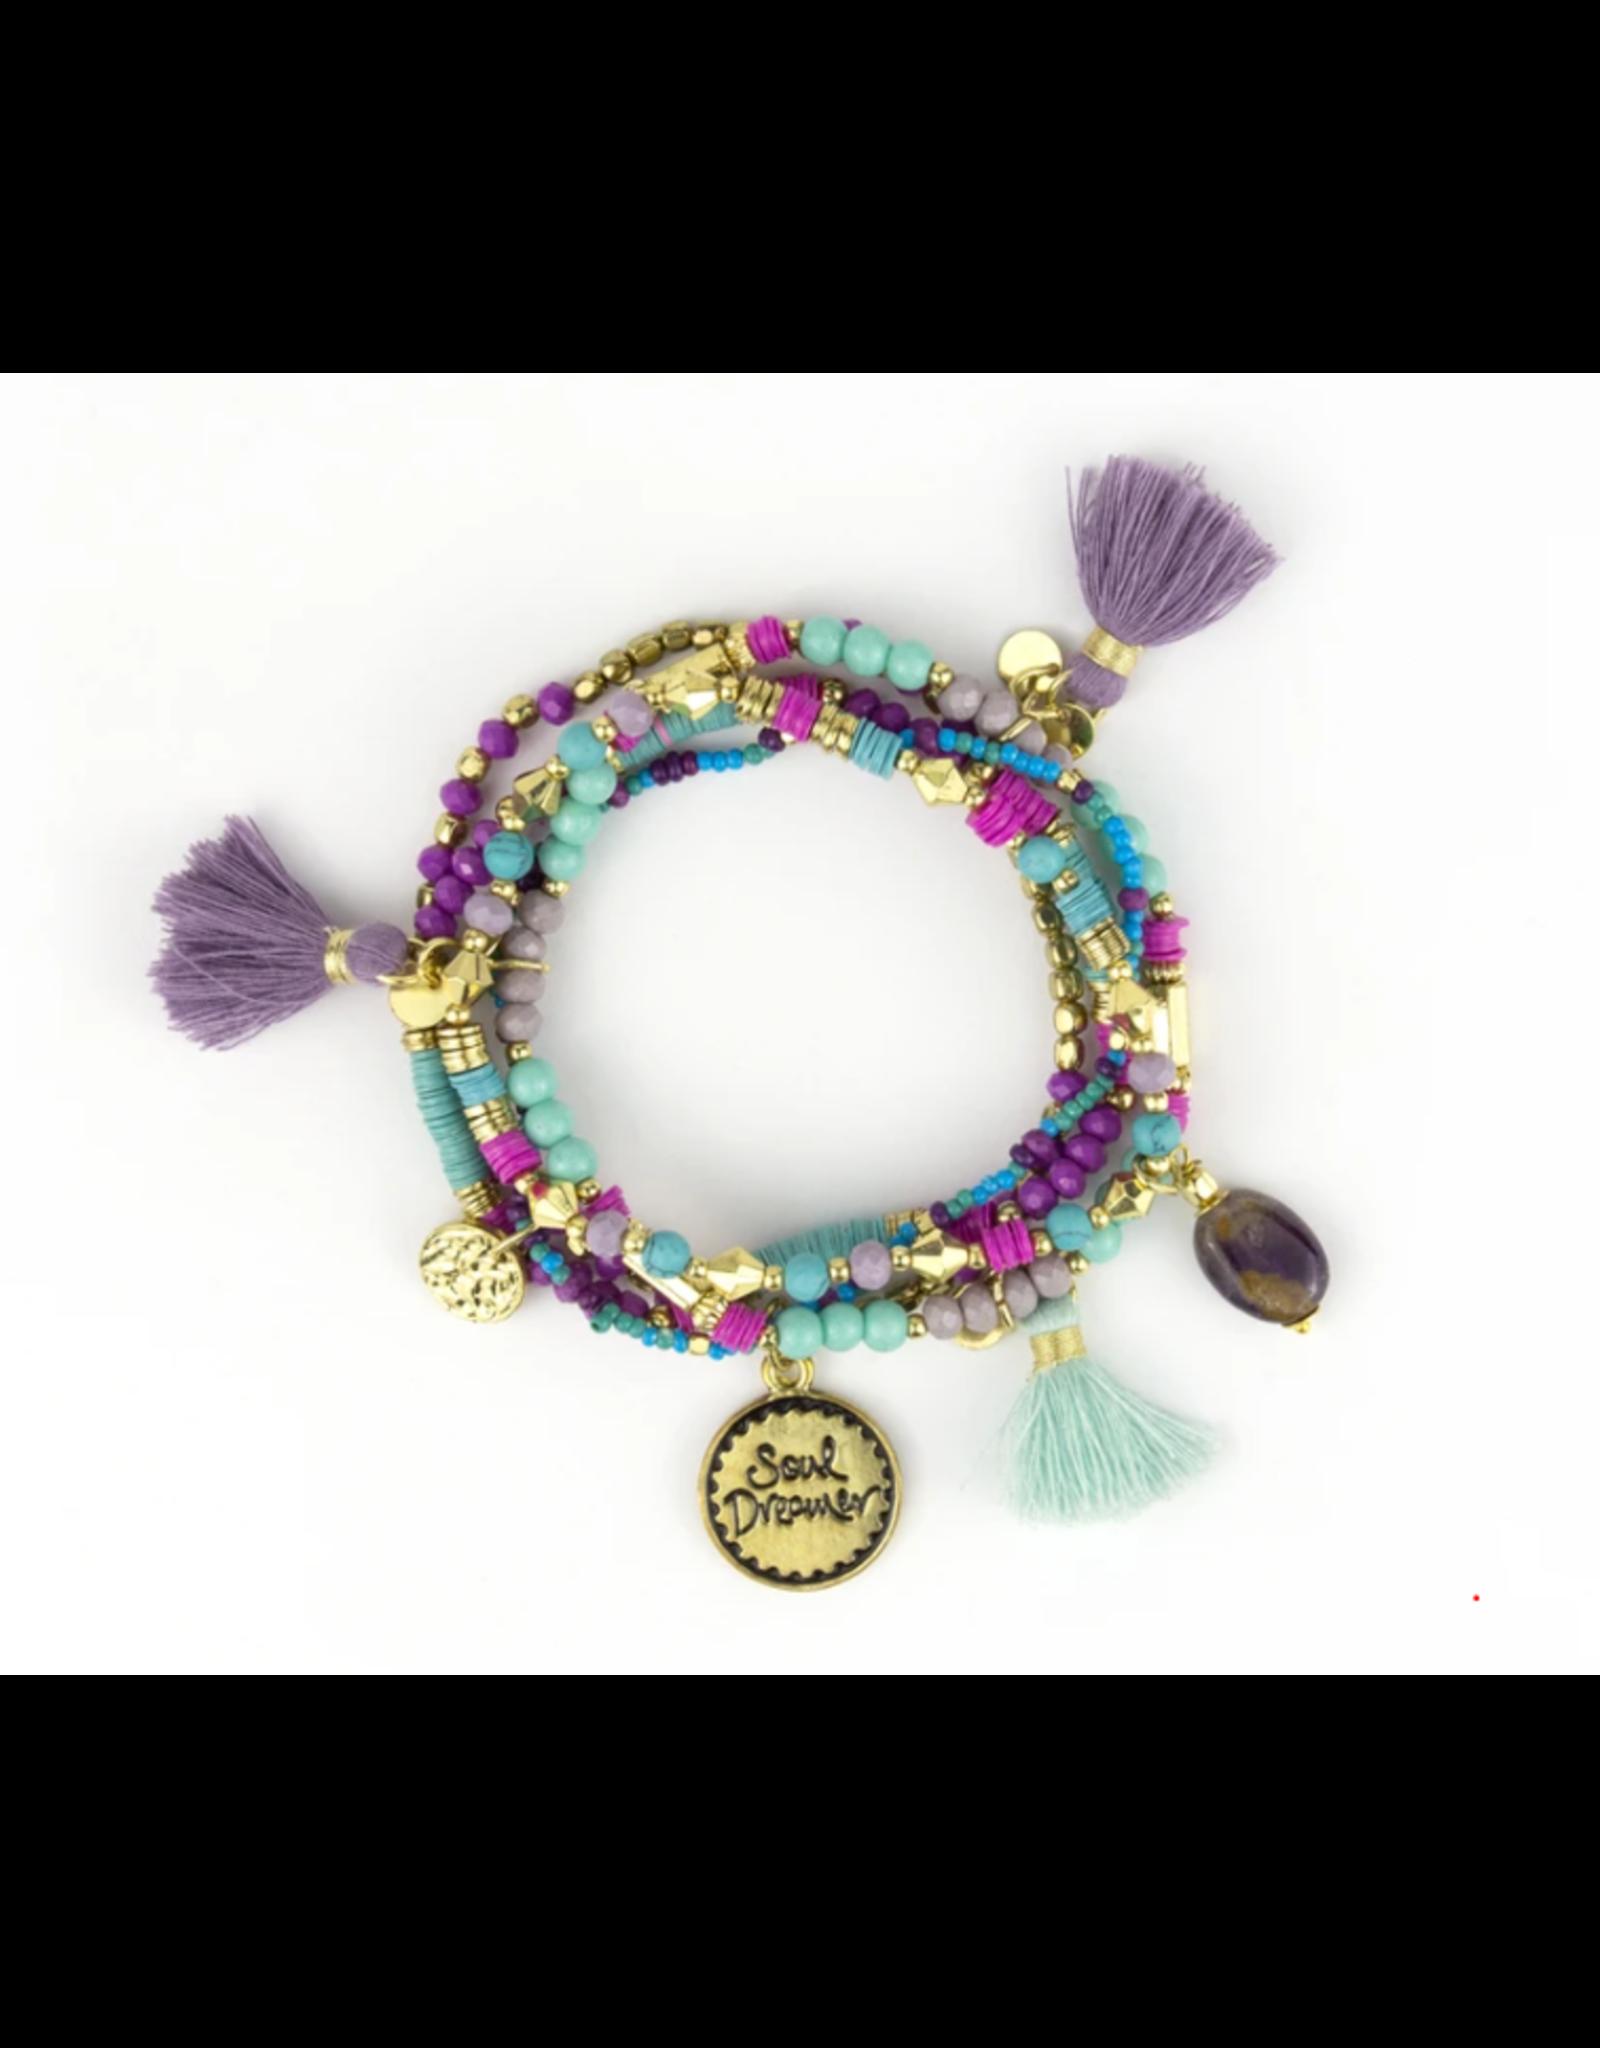 Intrinsic Soul Dreamer Charm Bracelet